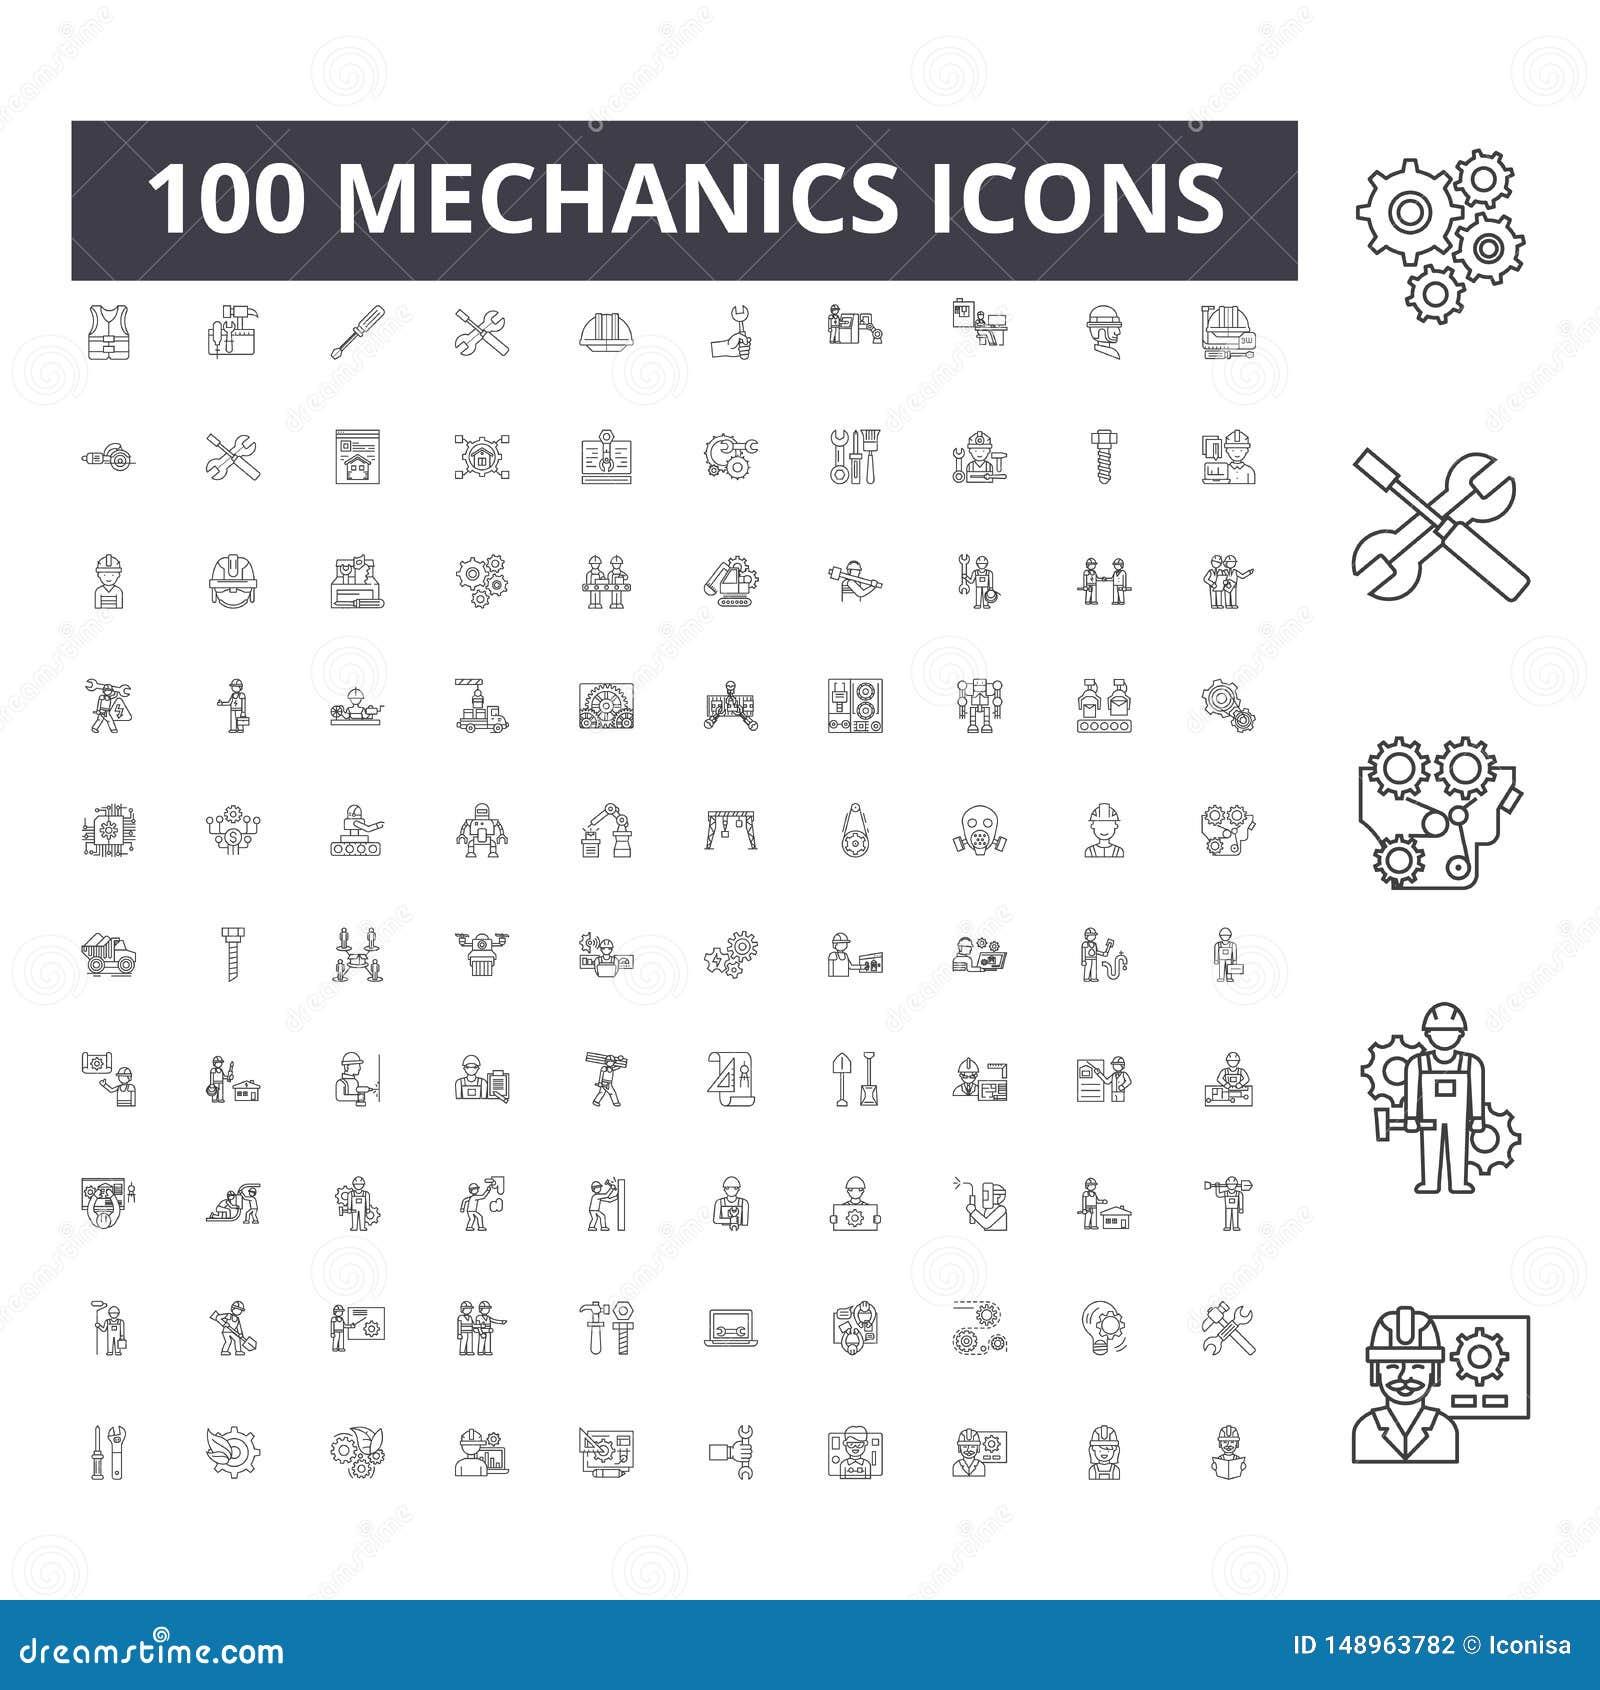 Mechanics line icons, signs, vector set, outline illustration concept